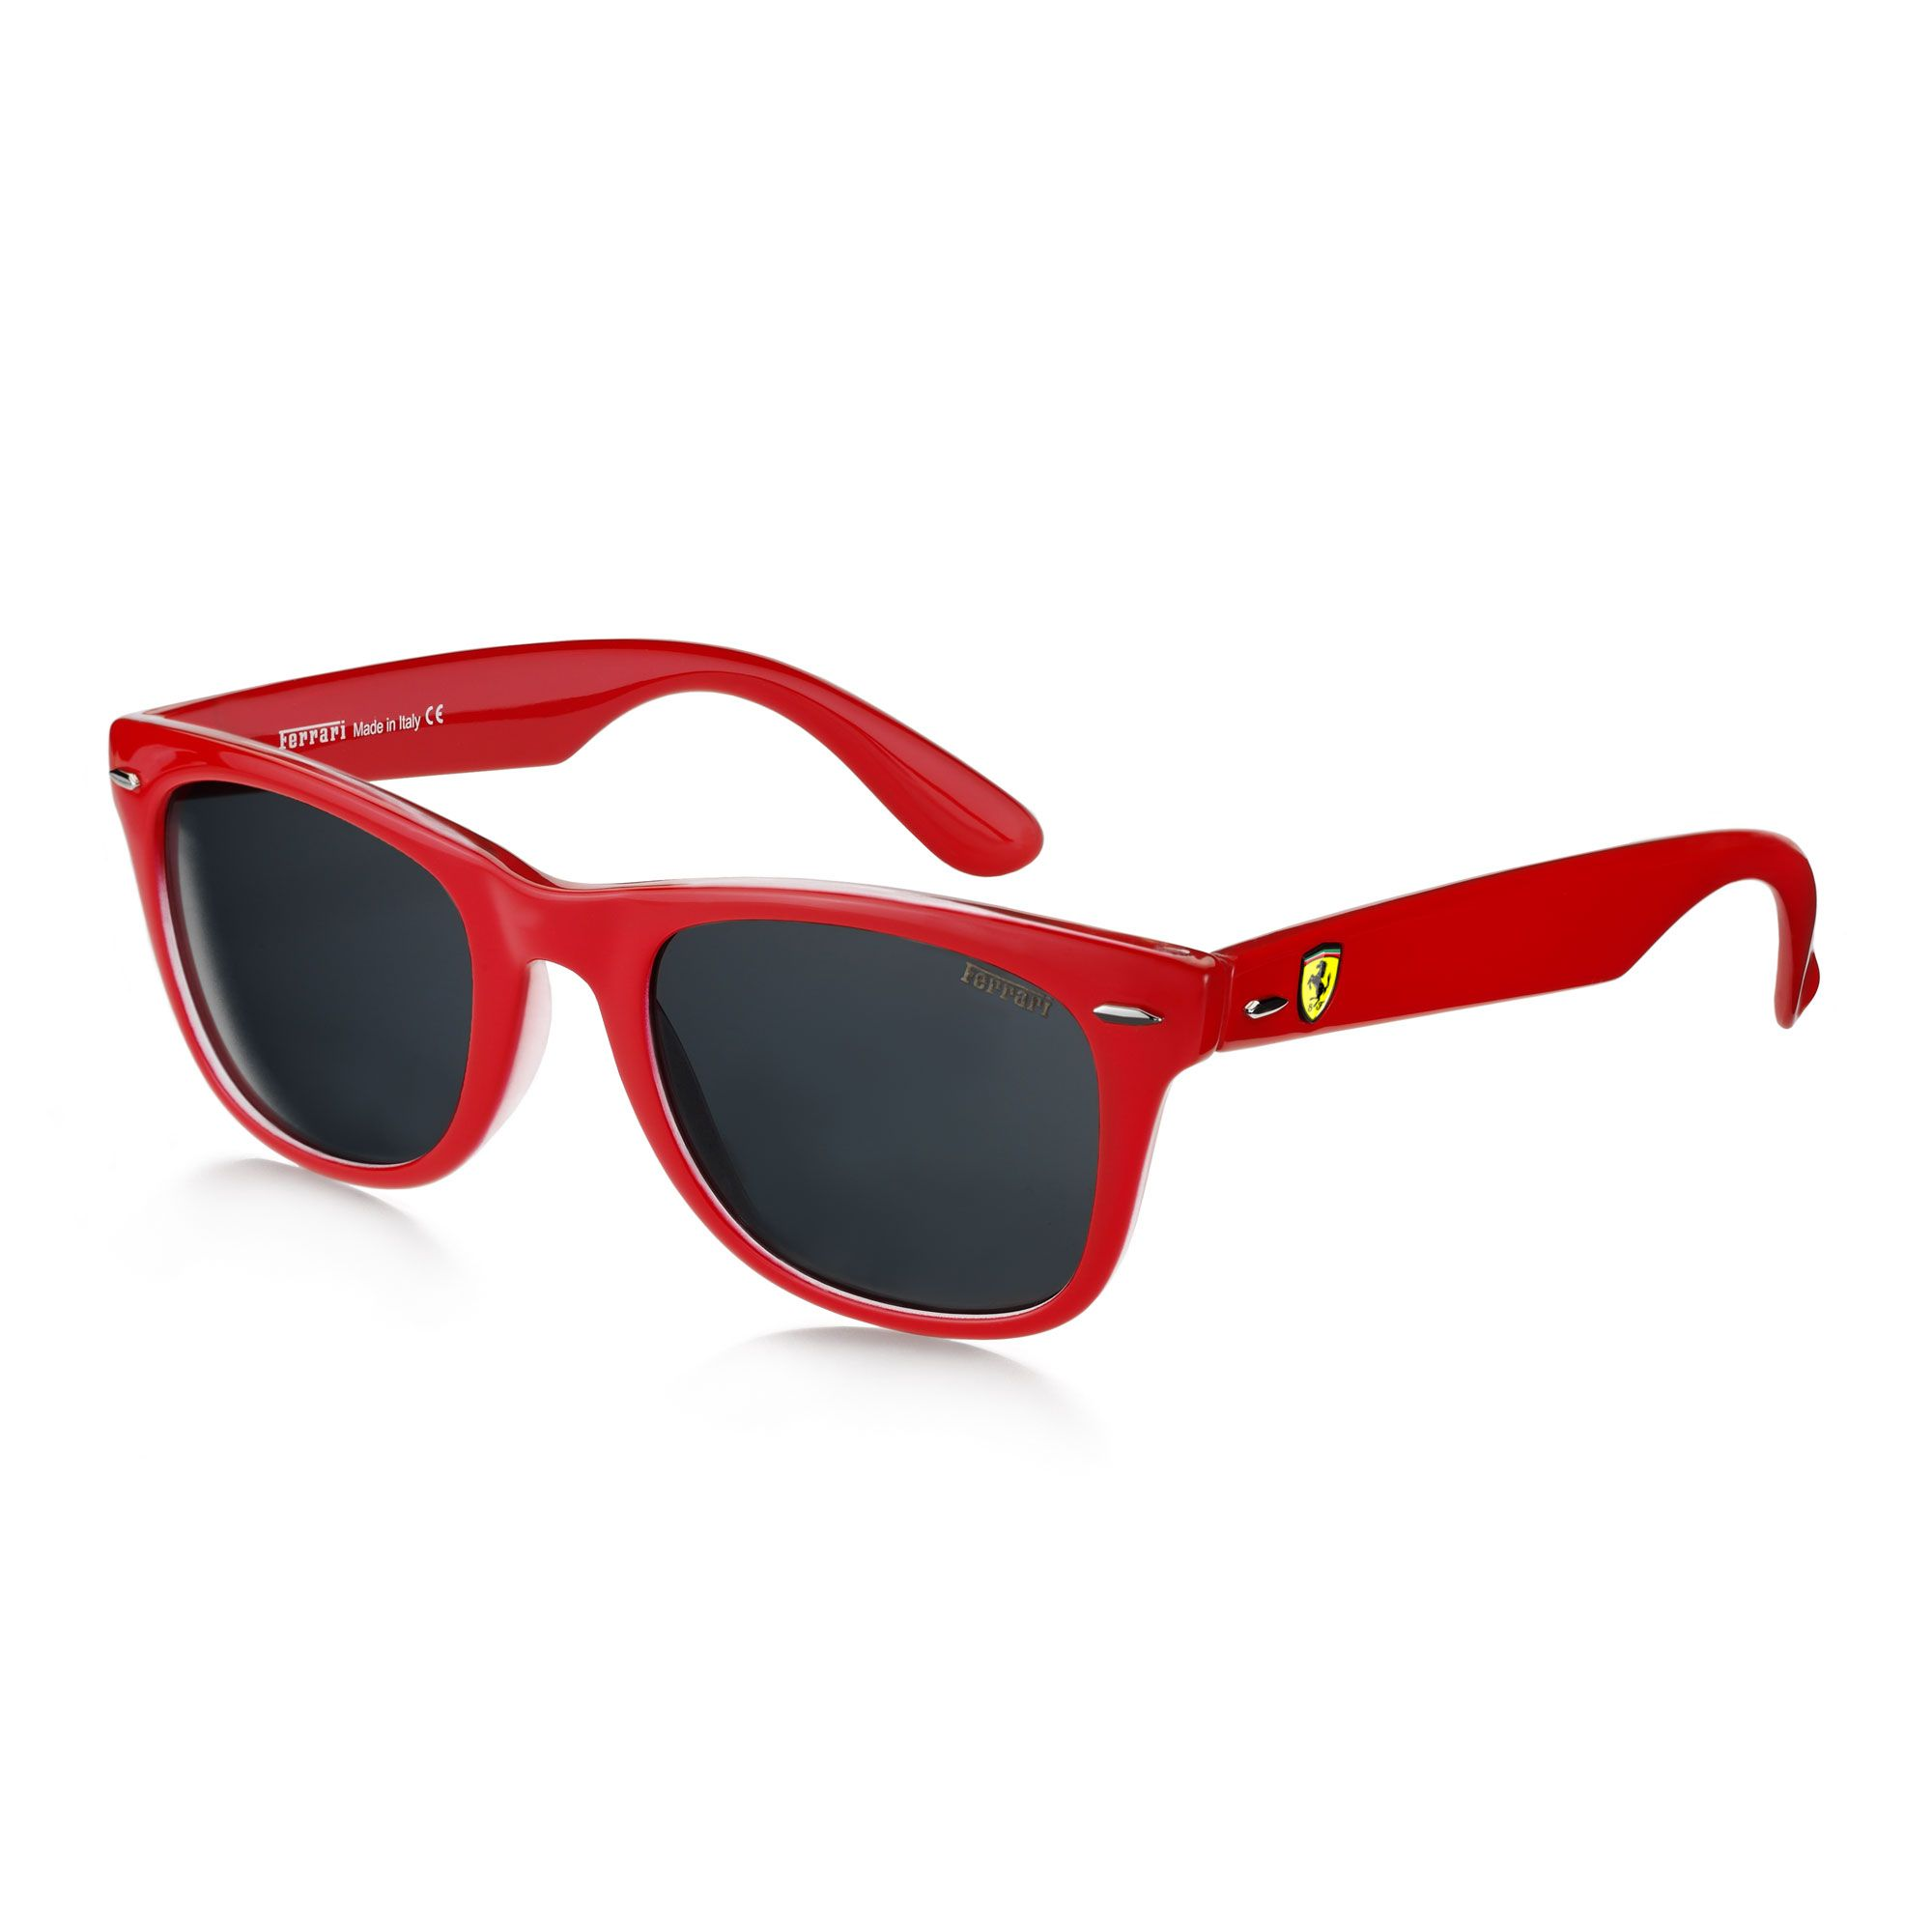 Ferrari Testarossa Red Sun Glasses Red Sunglasses Red Glasses Sunglasses